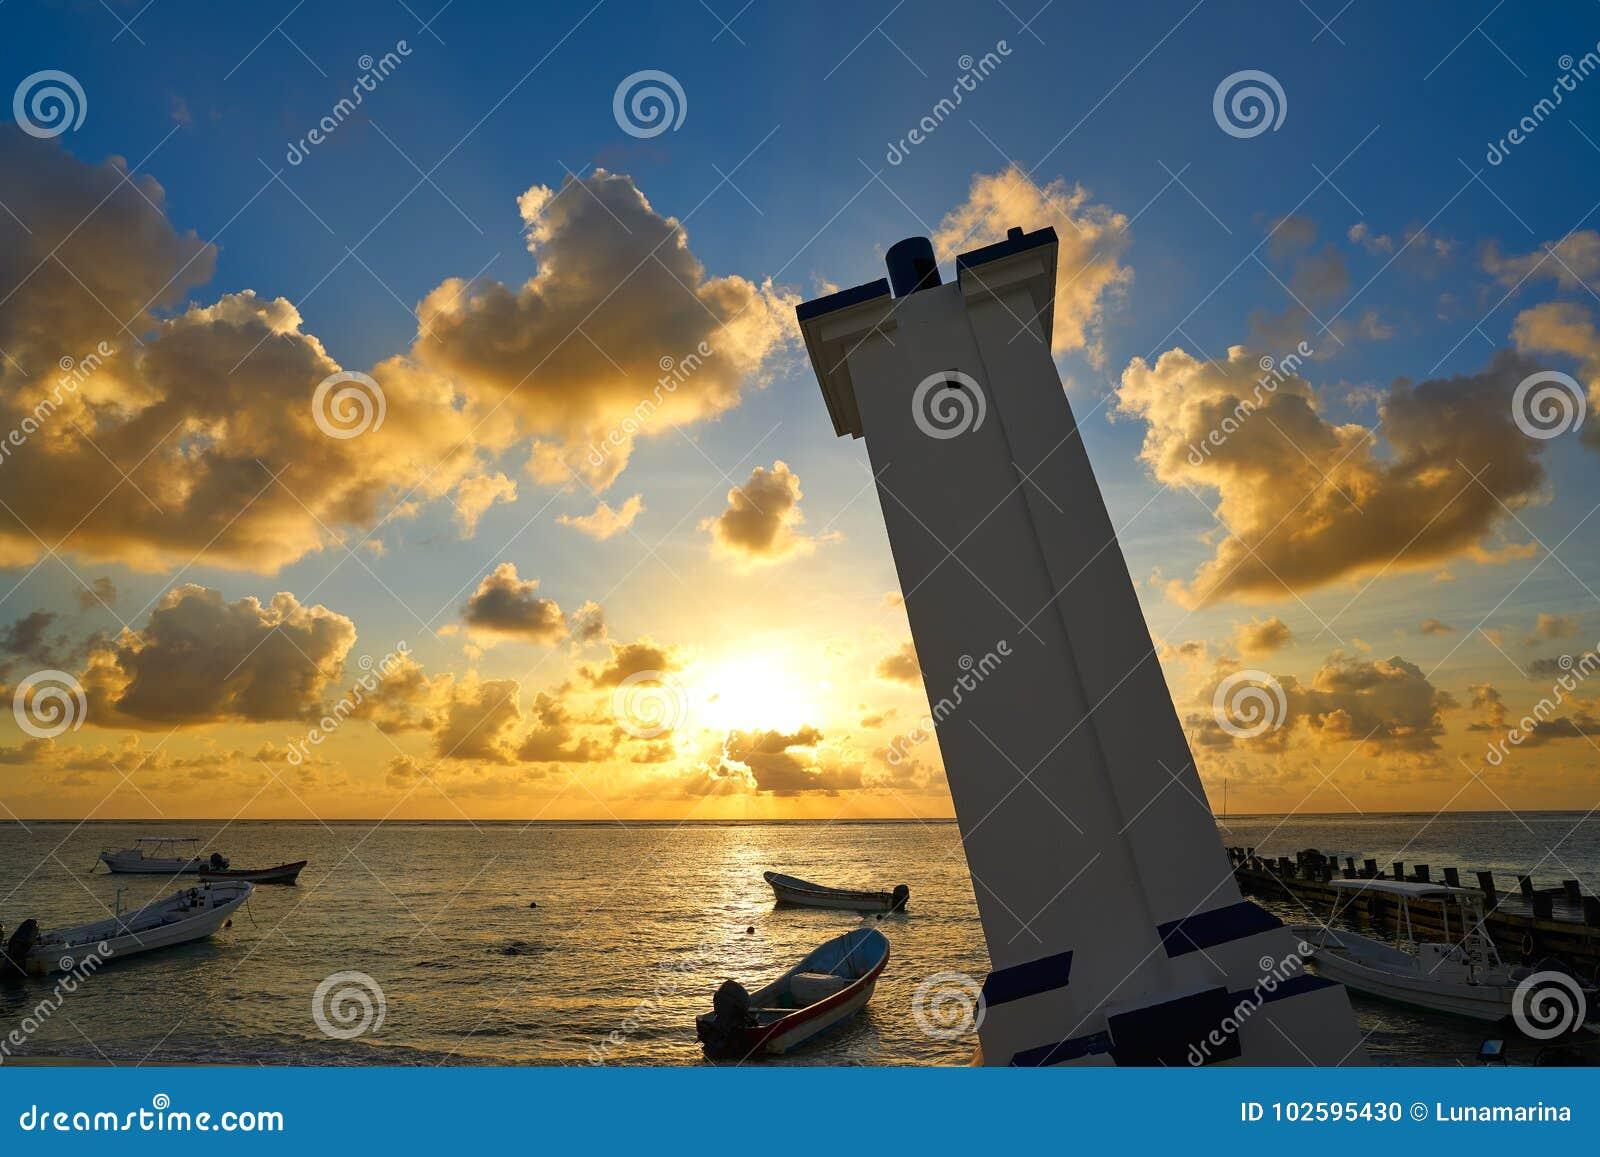 Puerto Morelos sunset in Riviera Maya